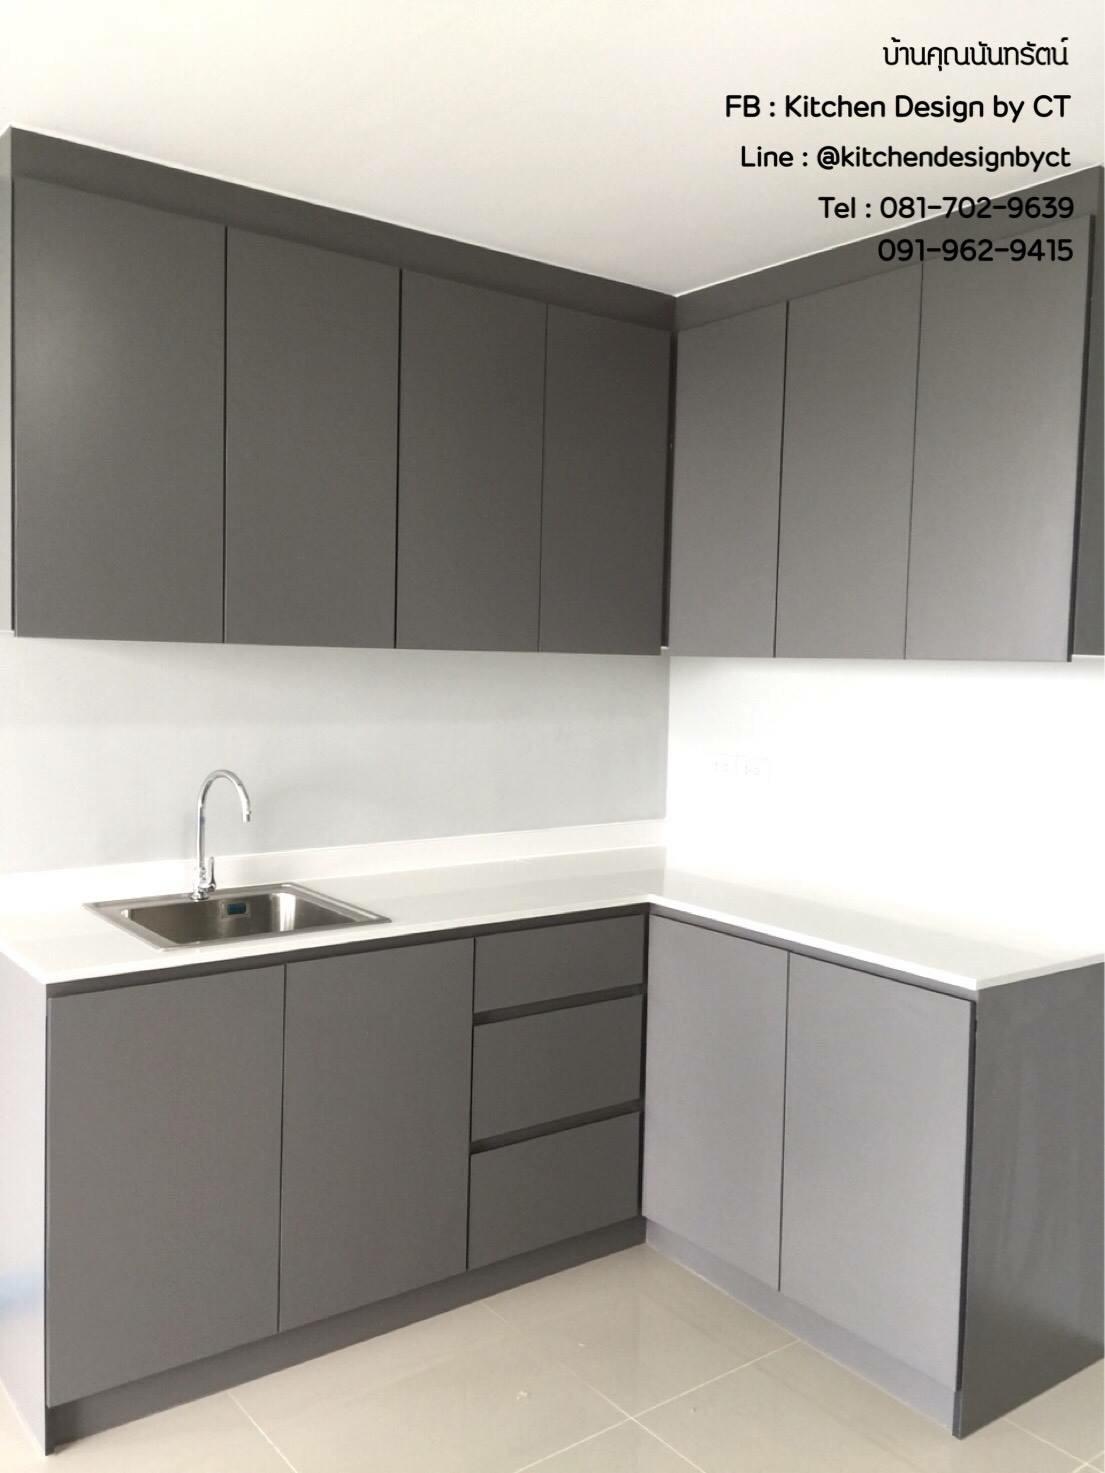 Modern Matt Grey Kitchen (ชุดครัวบิวท์อินสีเทาด้านสไตล์โมเดิร์น)